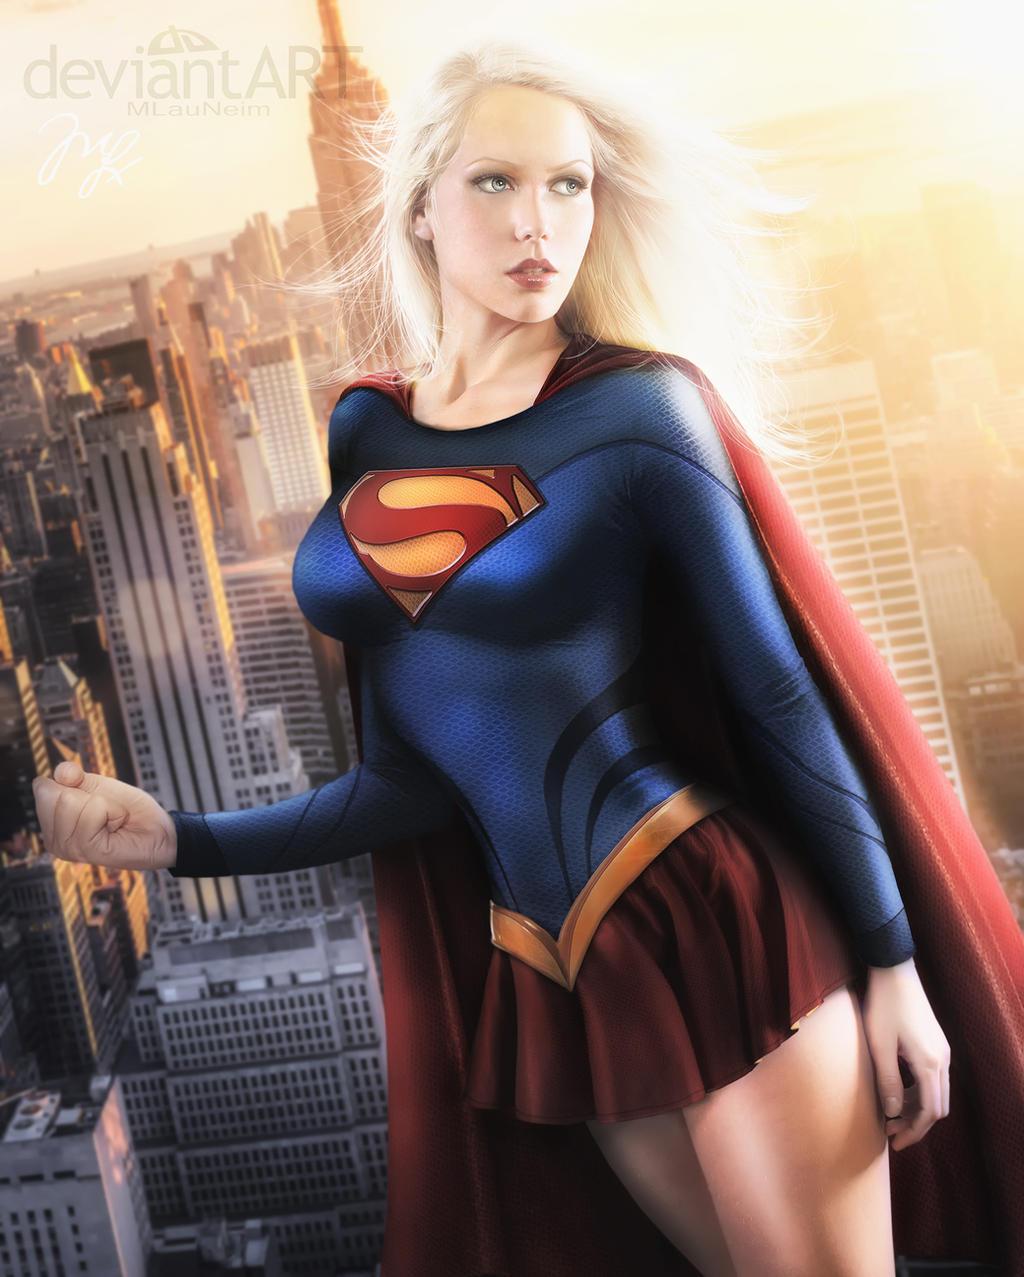 Supergirl II Movie 2013 COMMISSION by Maryneim